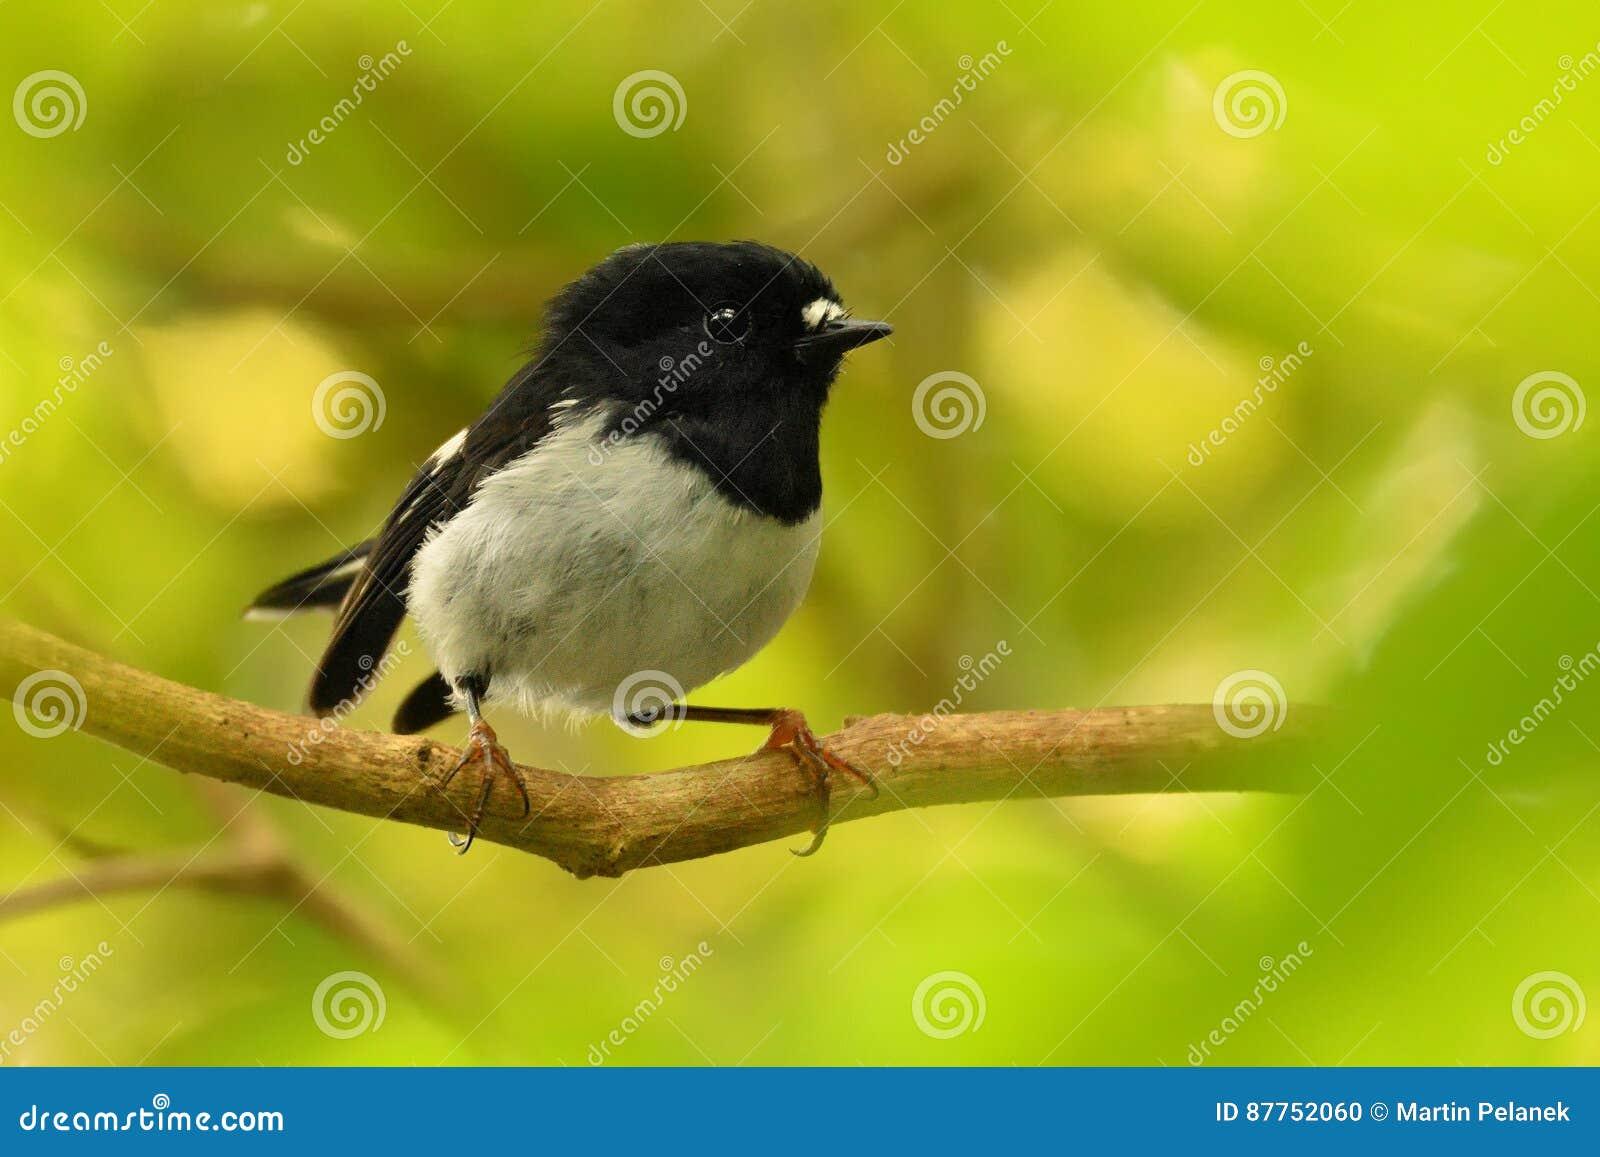 Toitoi macrocephala Petroica - βόρειο νησί Tomtit - miromiro - ενδημικό δασικό πουλί της Νέας Ζηλανδίας